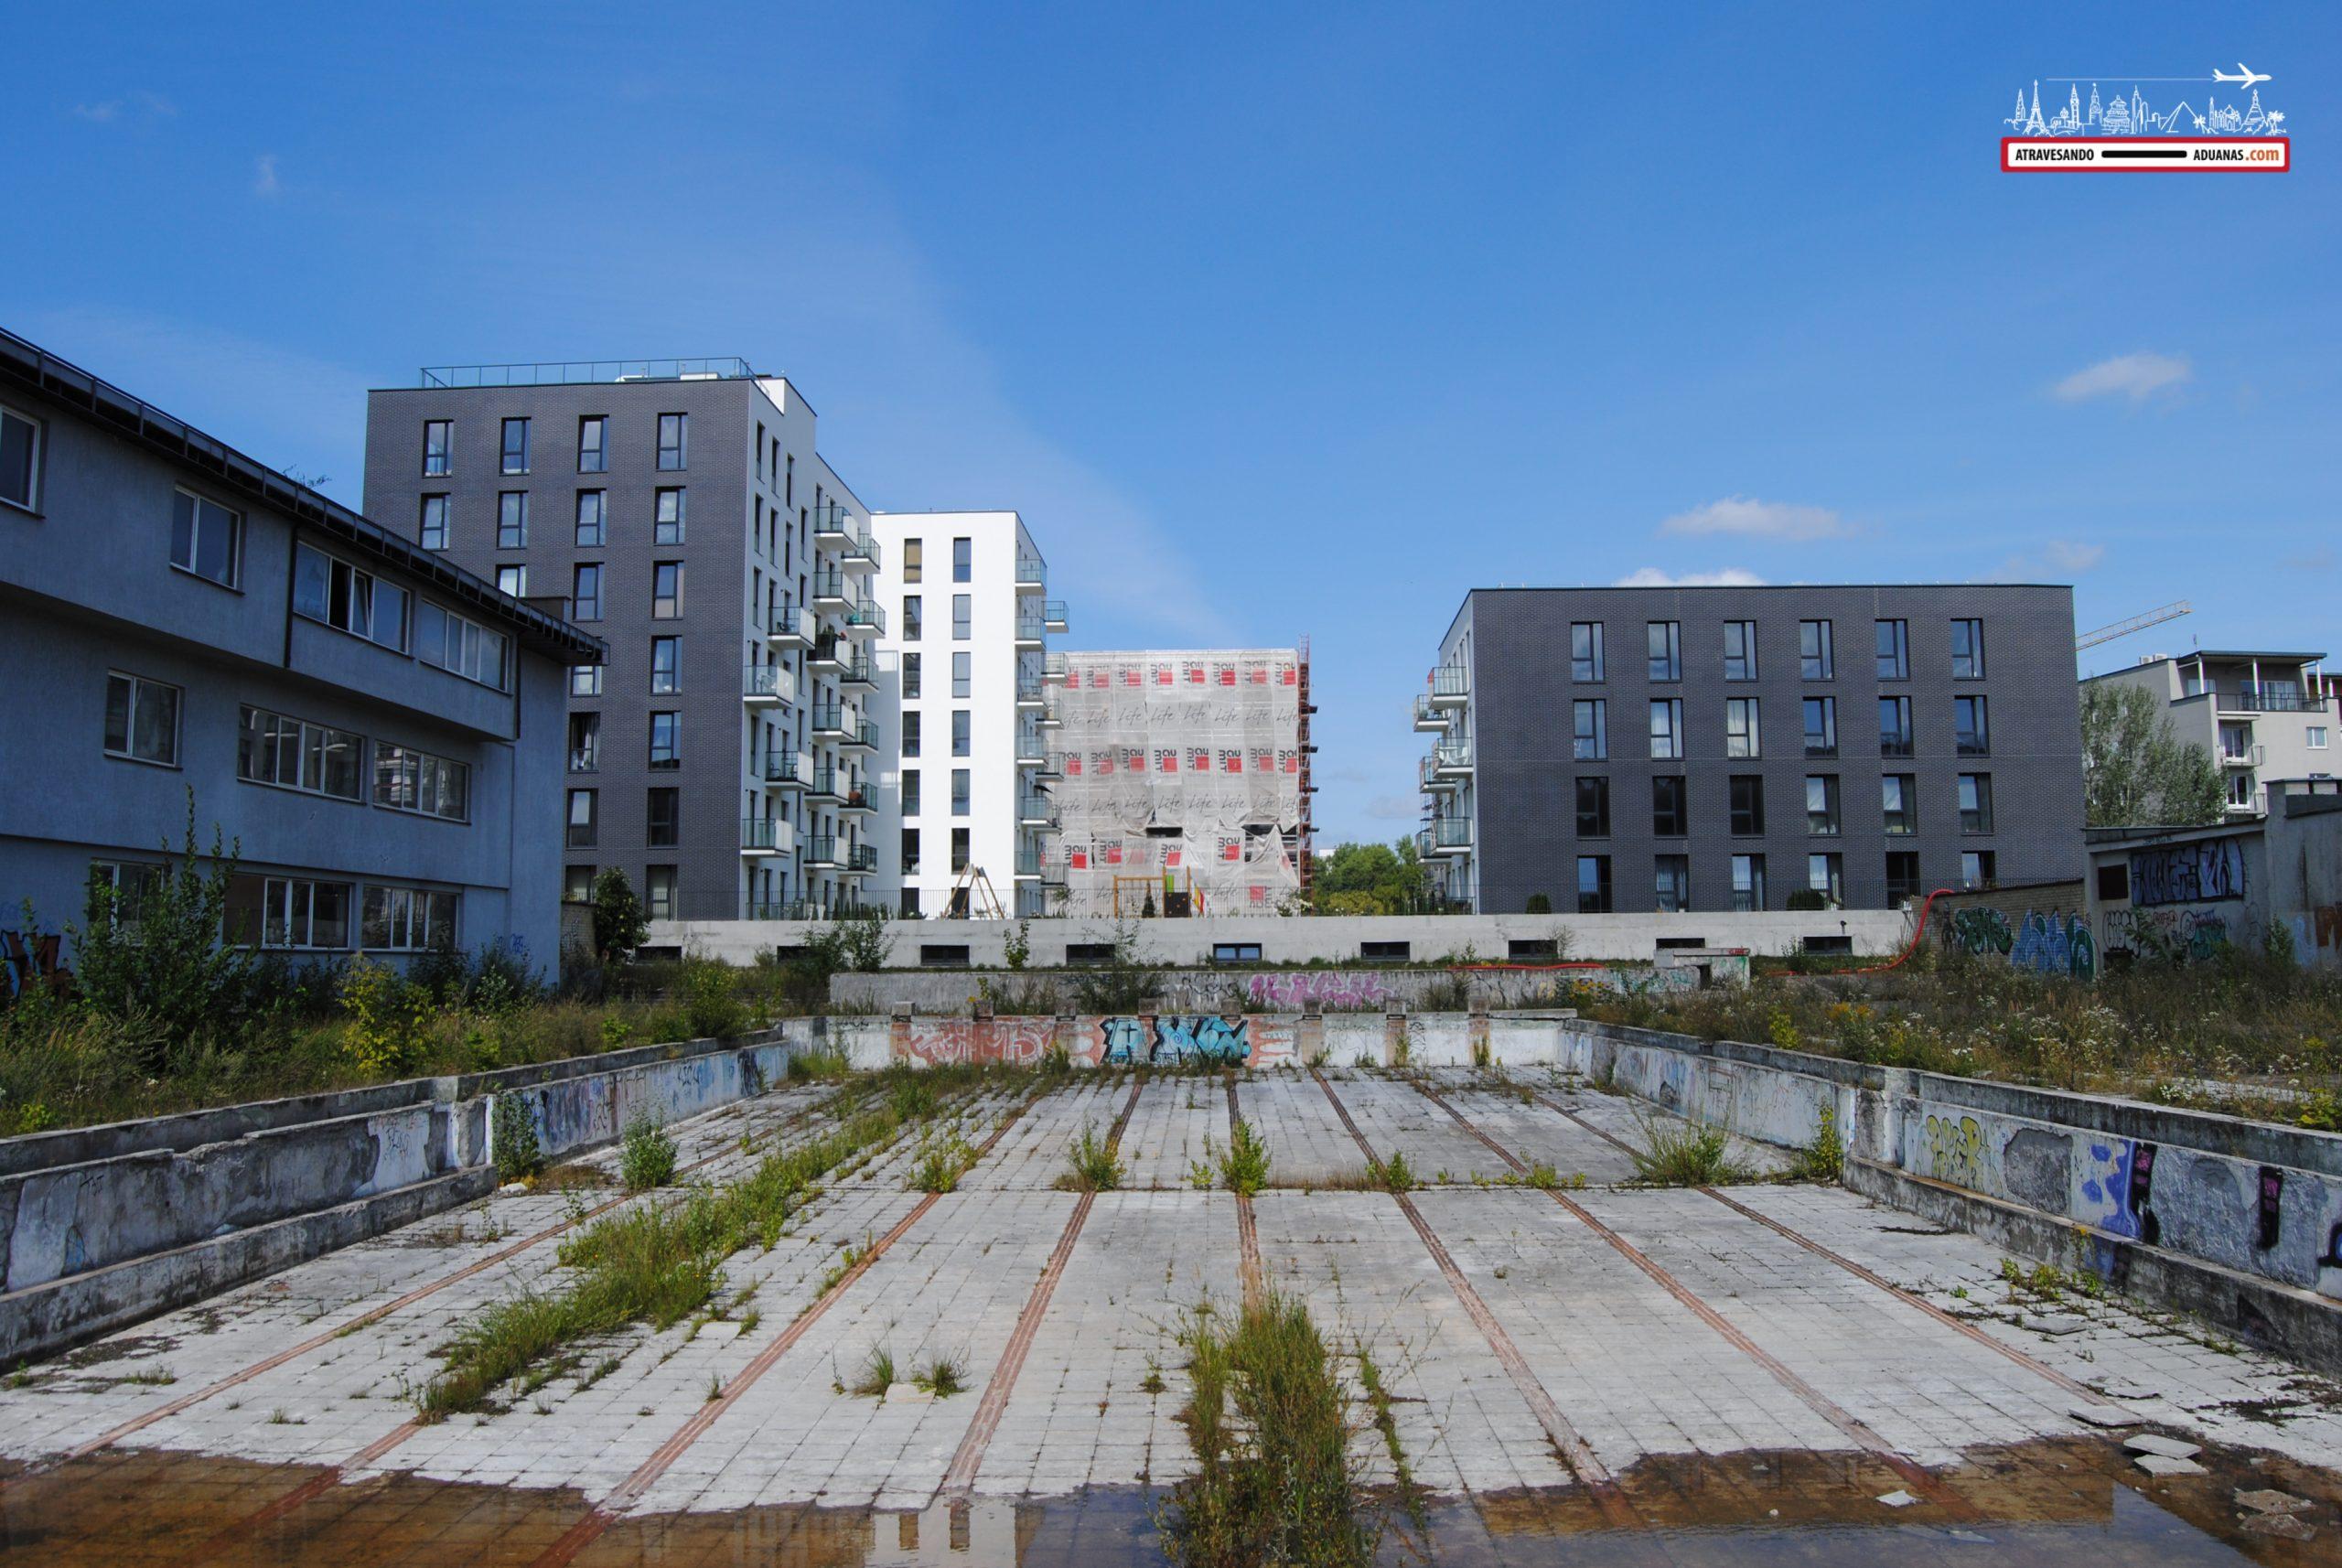 Piscina abandonada en Vilnius